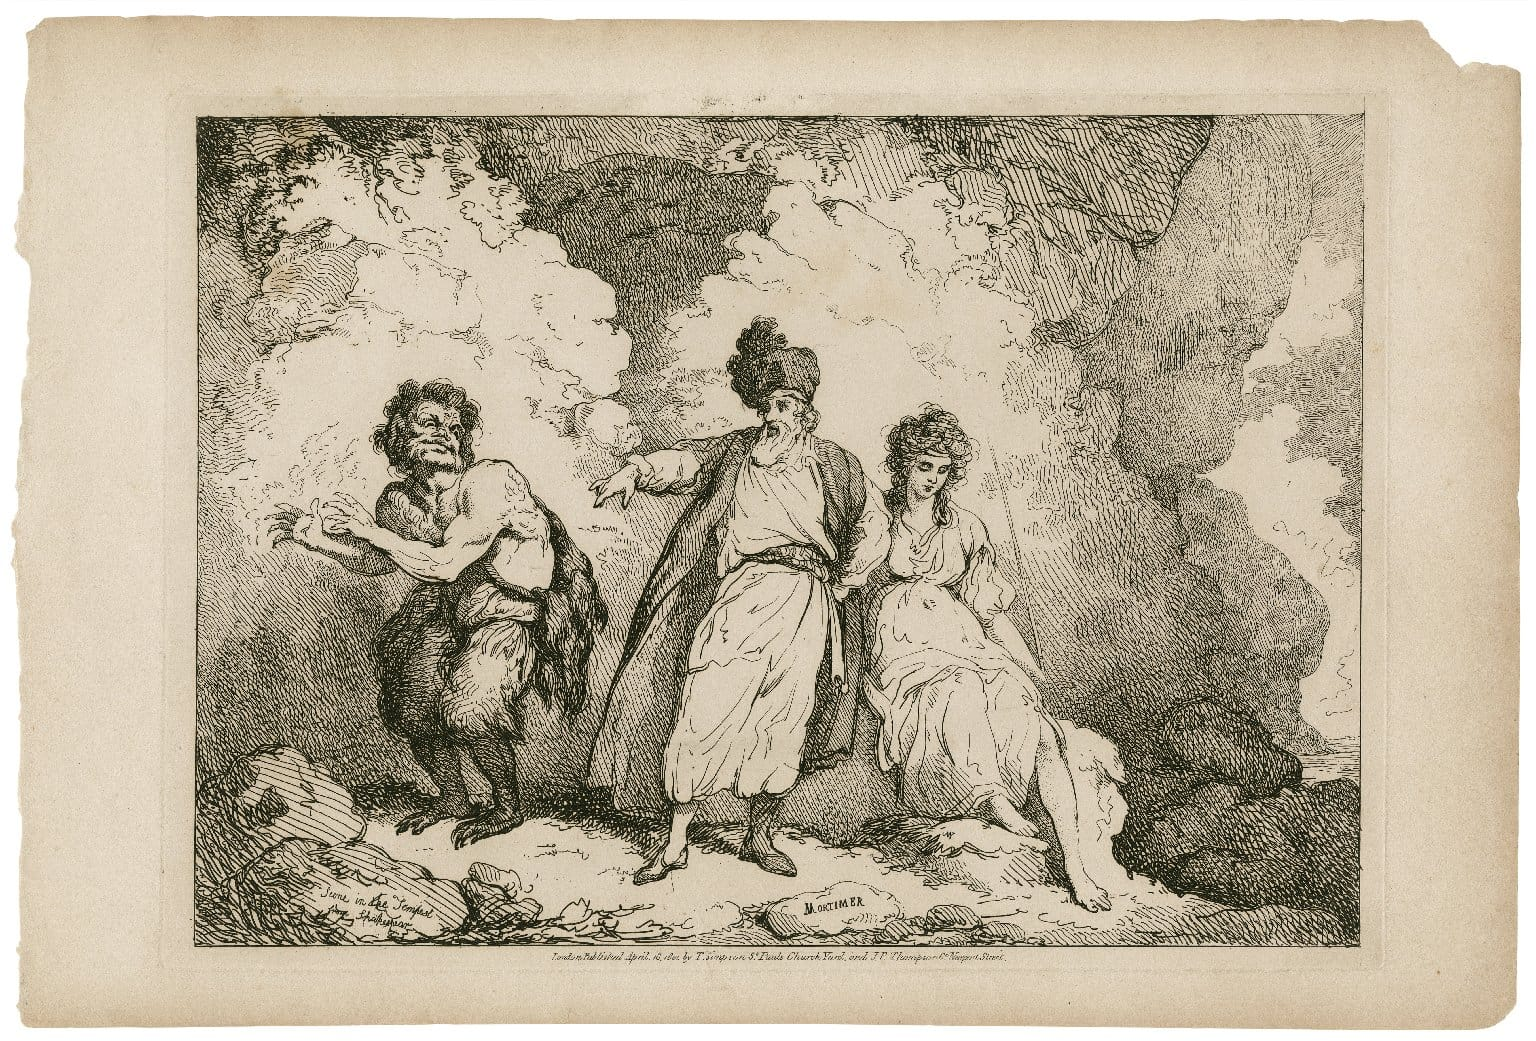 Discuss. Shakespeare with Roberta Barker